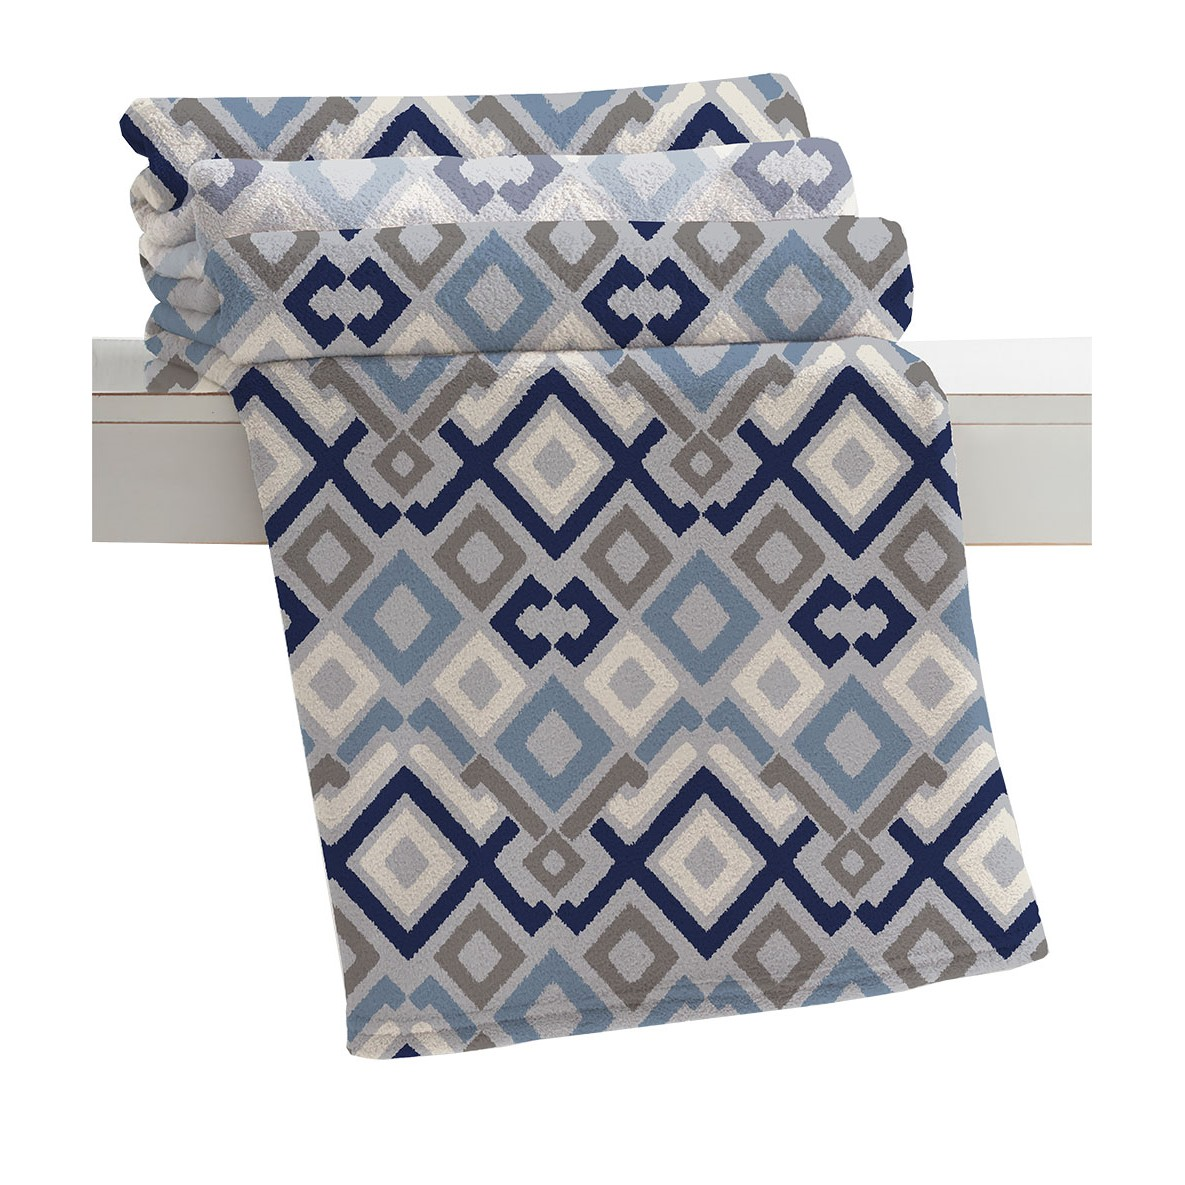 Manta Home Design Casal 180 x 220cm Microfibra Estampada - Corttex 007